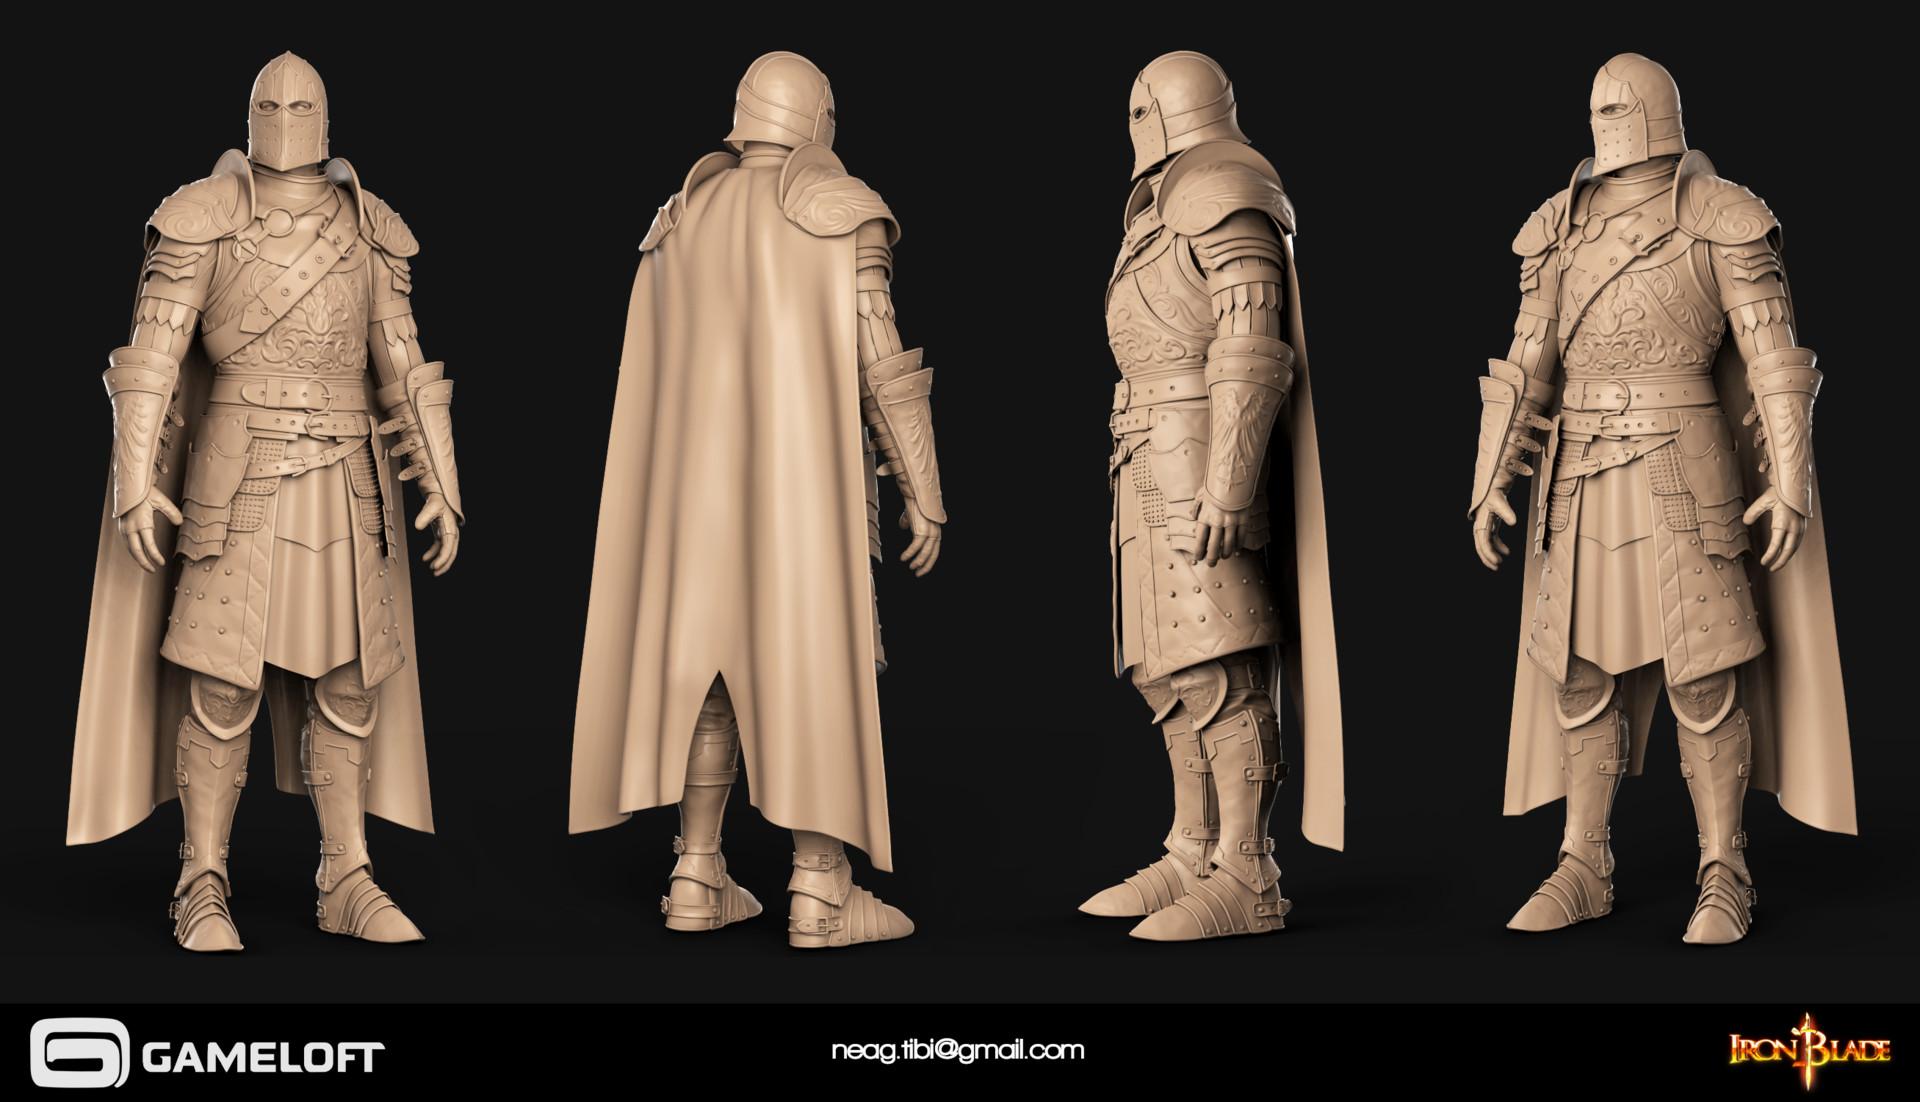 Tibi neag tibi neag iron blade mc armor 02c high poly